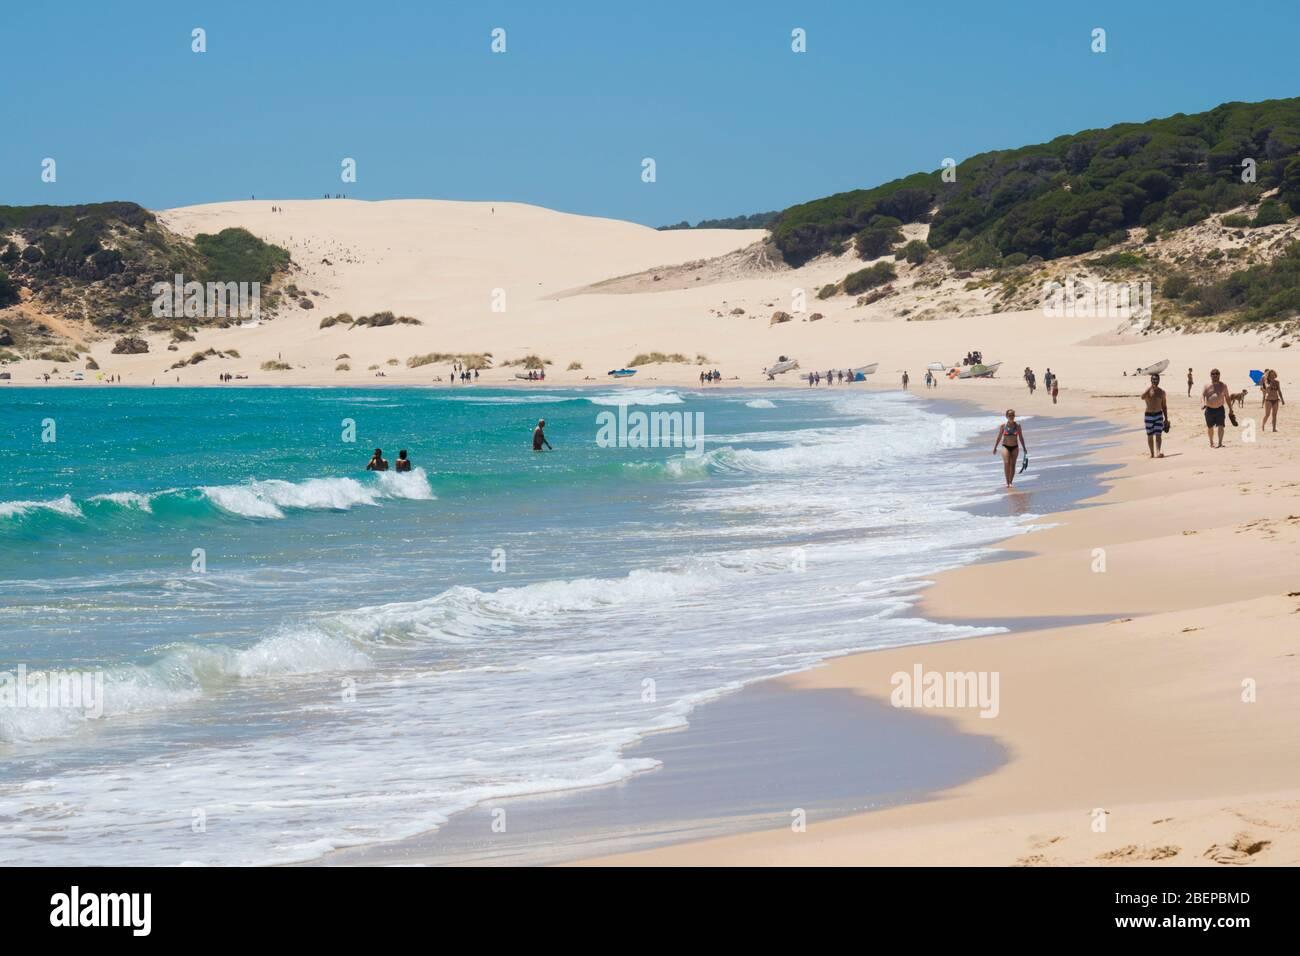 Bolonia, Costa de la Luz, Cadiz Province, Andalusia, southern Spain.  Bolonia beach.  Playa de Bolonia.  In the background is the Bolonia sand dune, o Stock Photo